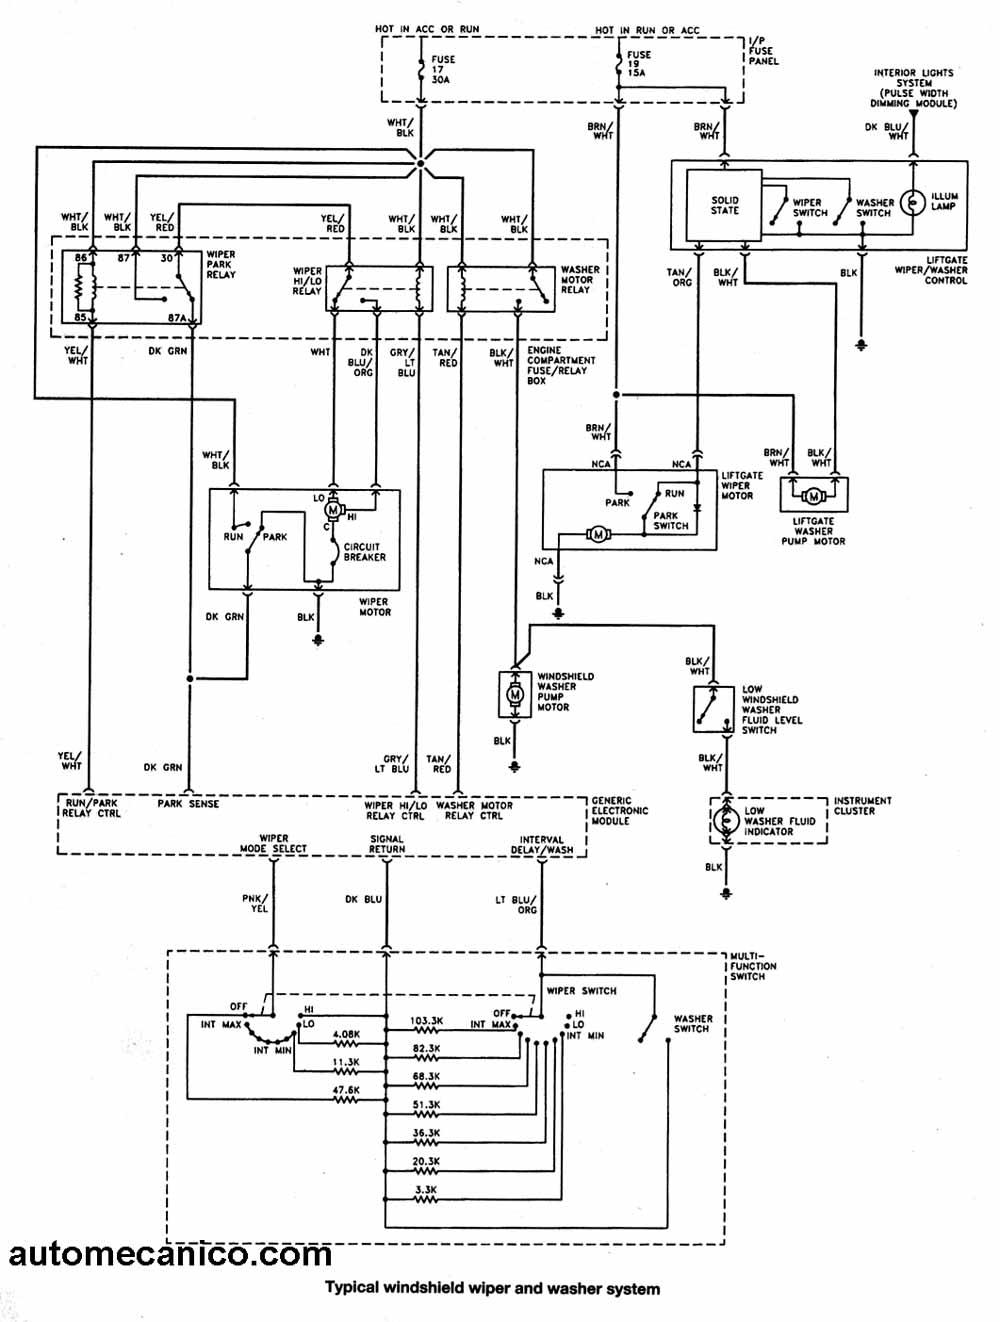 apexi avcr wiring diagram 2001 ford f150 headlight switch diagramas de un relay 1996 - information of